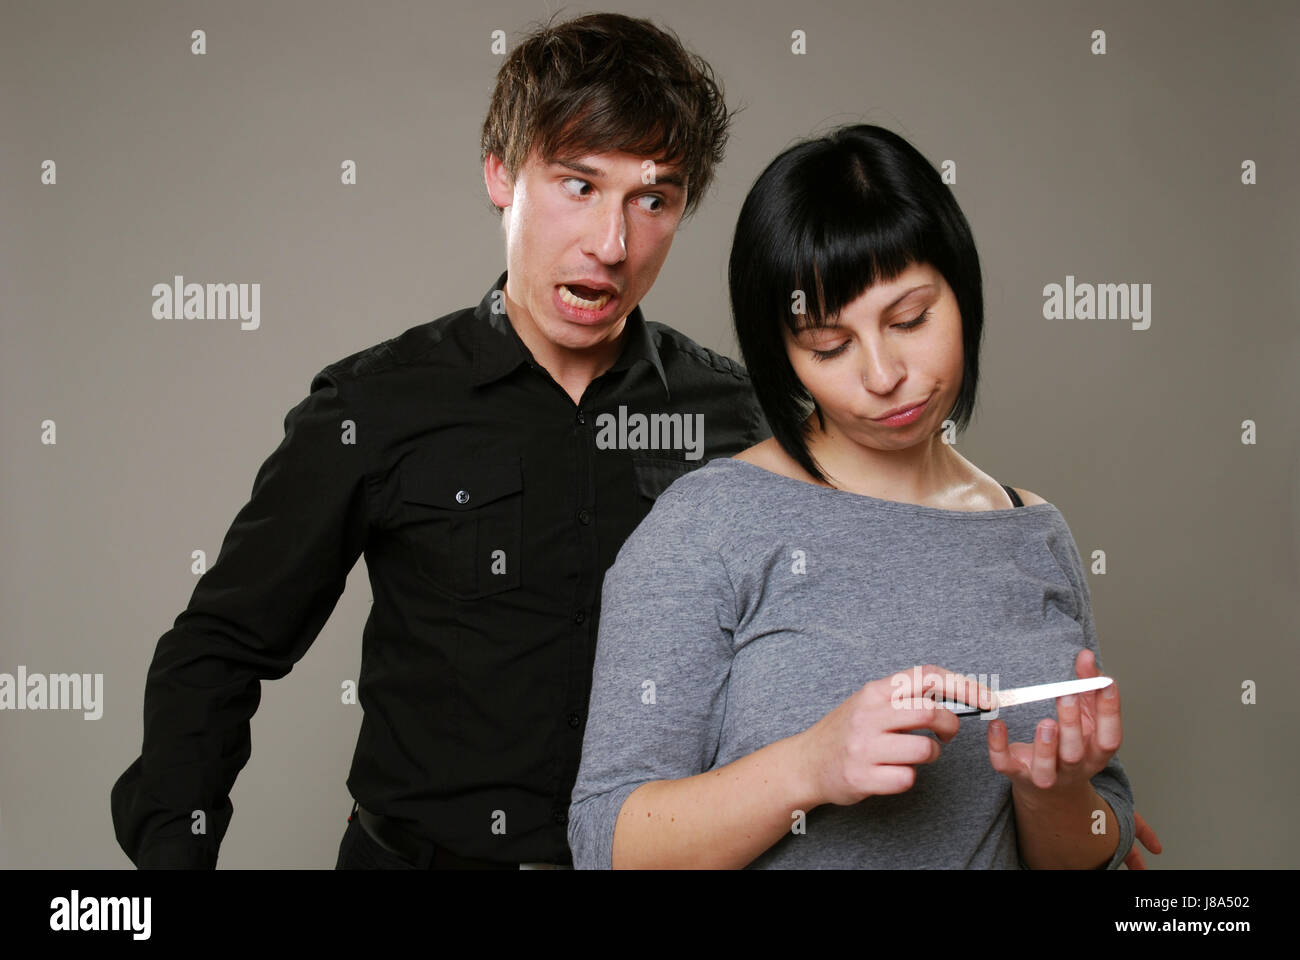 conflict, argue, boredom, bored, love, in love, fell in love, stress, couple, Stock Photo